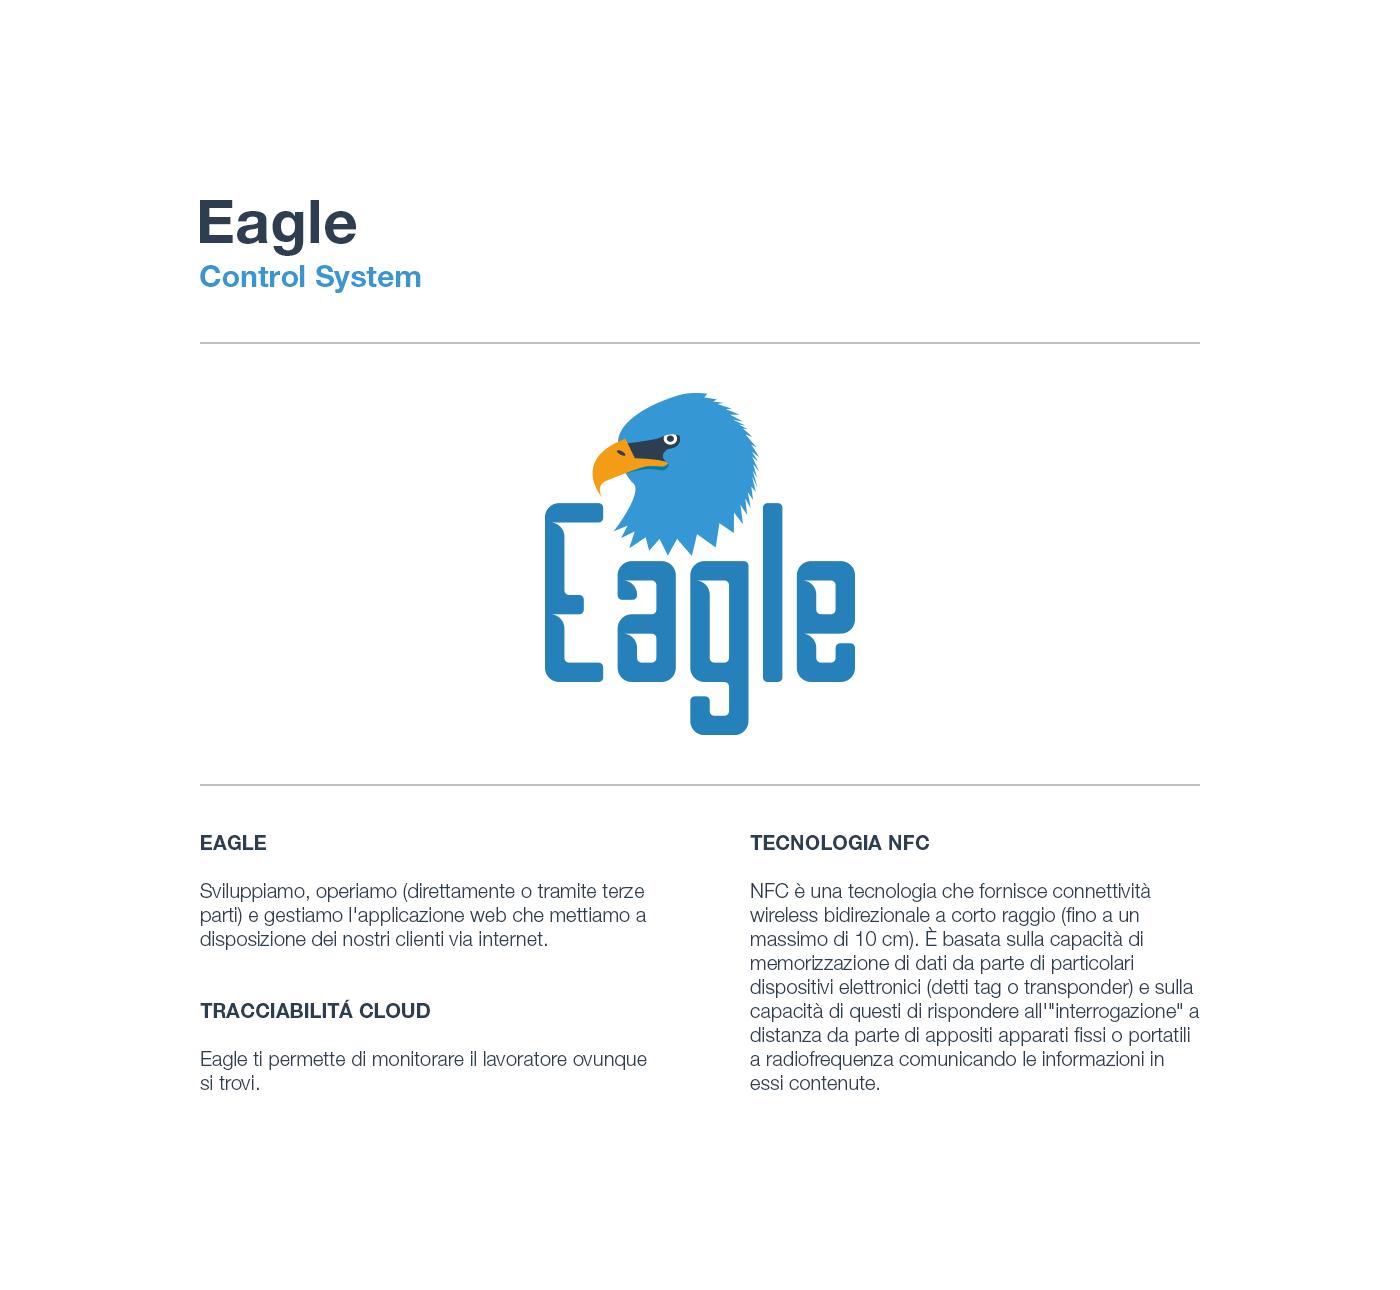 control system tag report badge smartphone tablet controllo remoto cms gestione design ispezione eagle Monitoring NFC